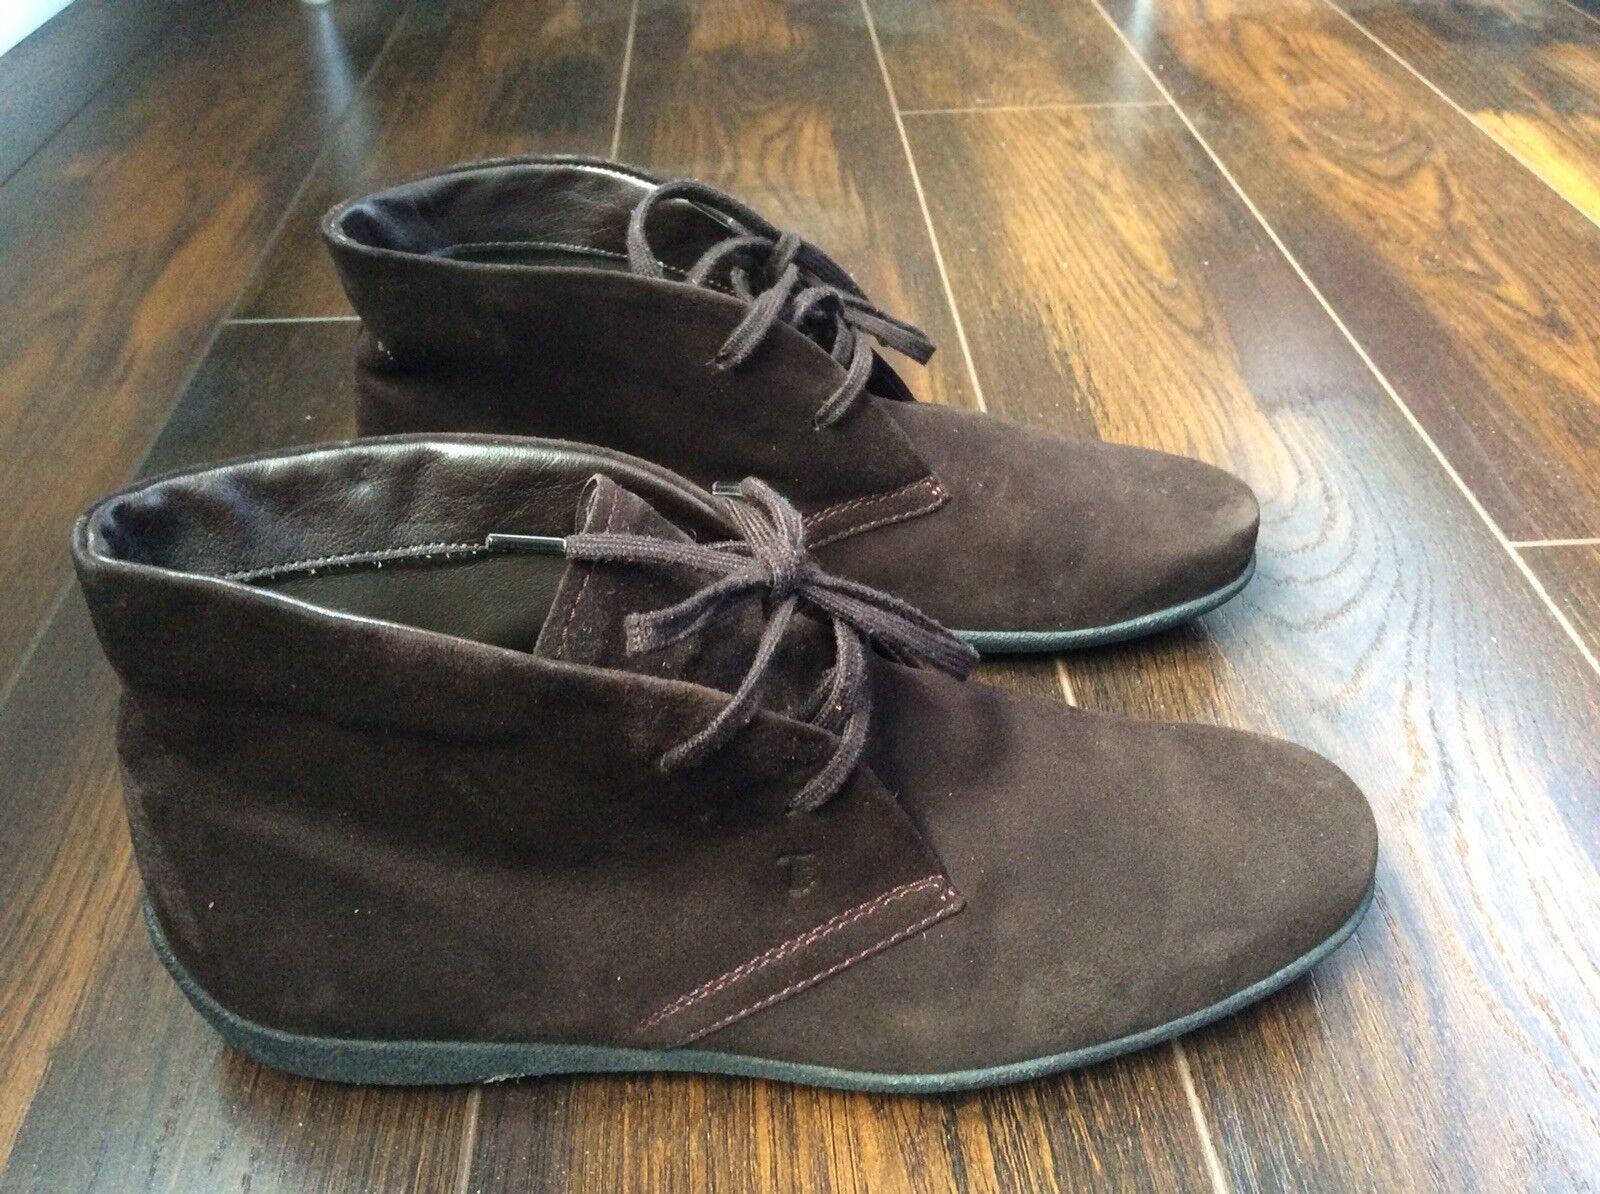 Tods Damenschuhe Braun Suede Leder Driving Driving Leder Ankle Stiefel Stiefel ... 8f0707